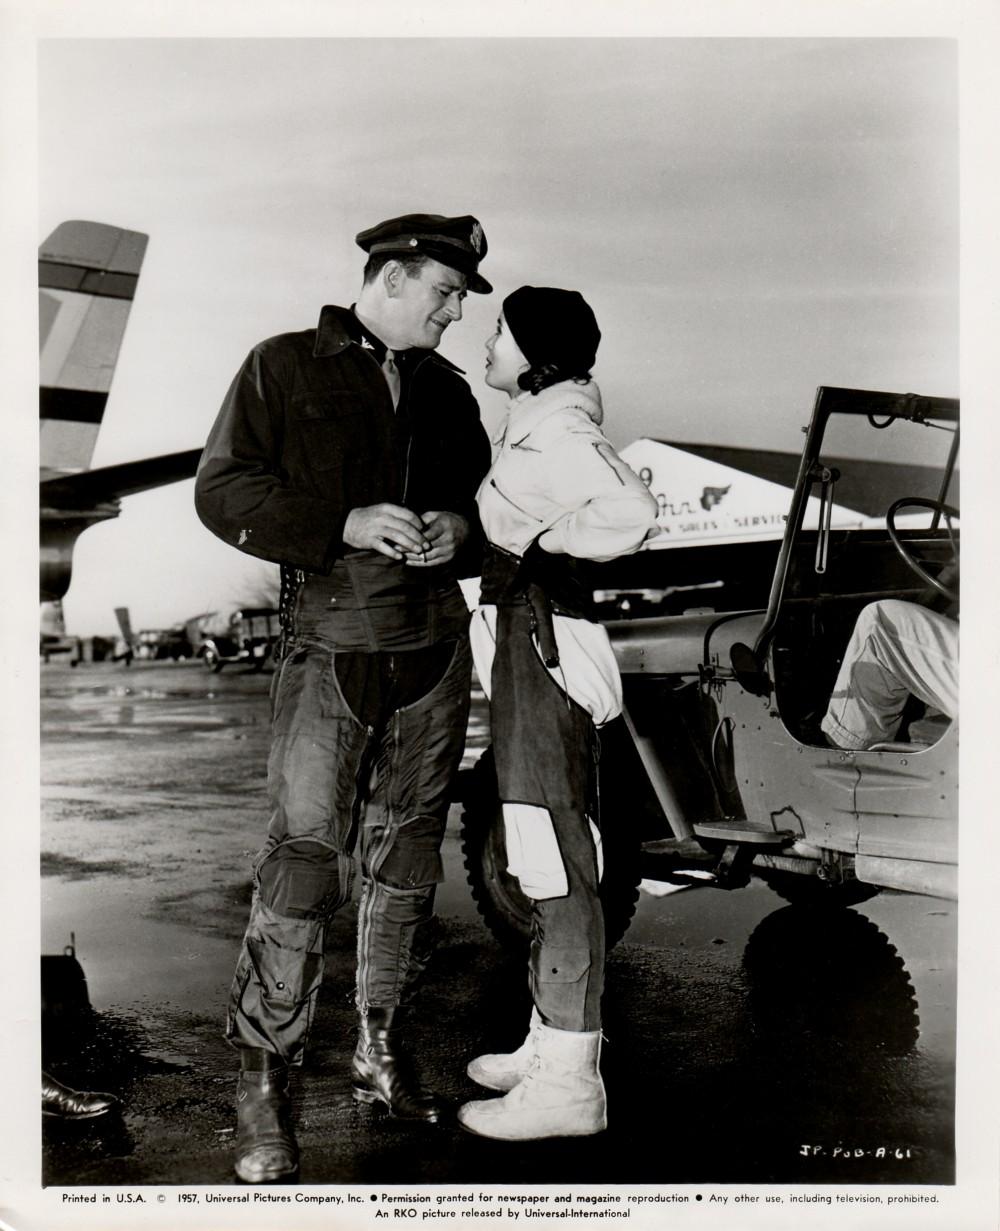 Les espions s'amusent - Jet pilot - 1957 Wayne412